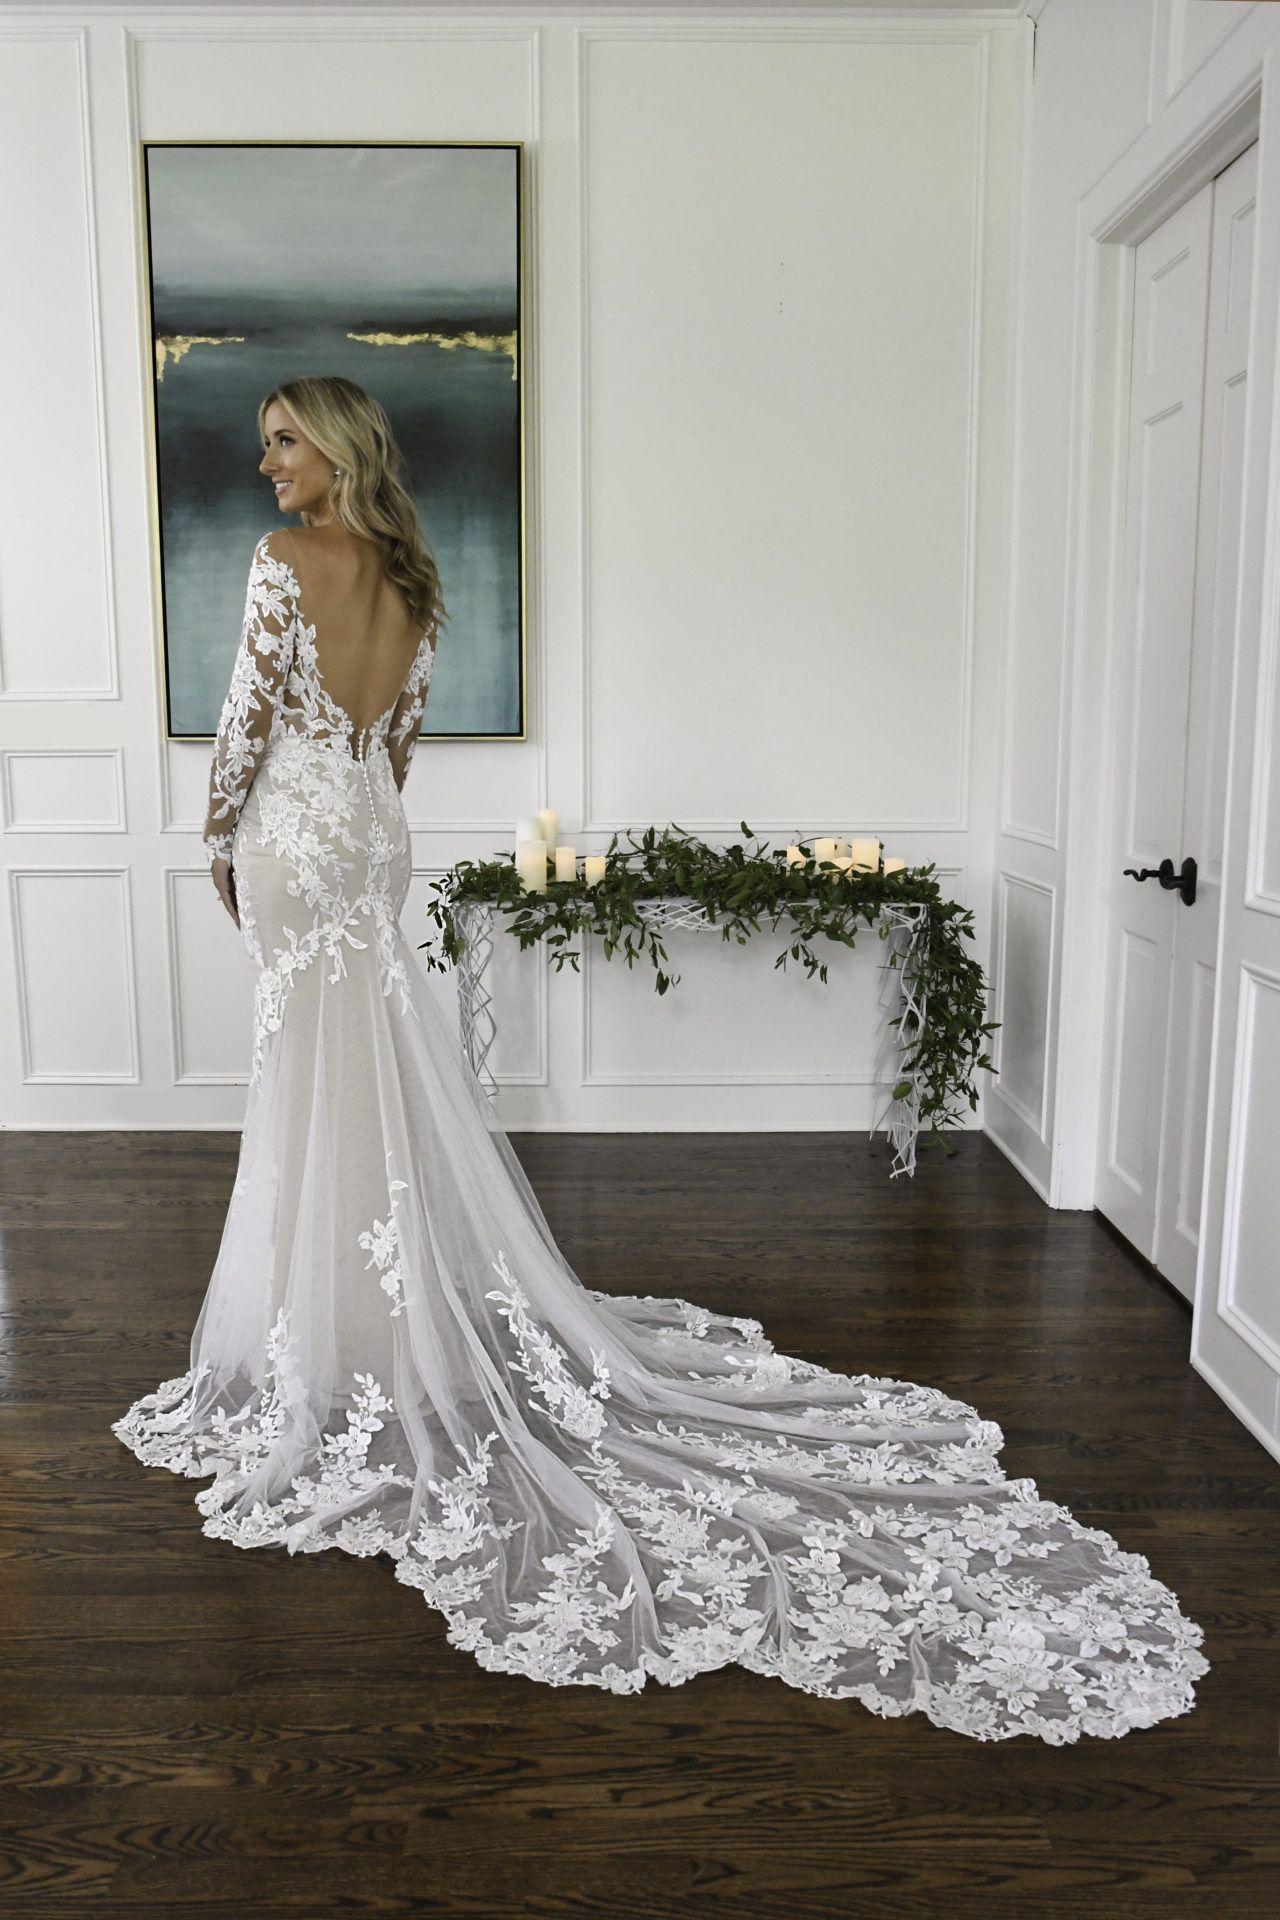 Low Back Floral Lace Wedding Dress With Long Sleeves Essense Of Australia Essense Of Australia Wedding Dresses Wedding Dresses Elegant Wedding Gowns [ 1920 x 1280 Pixel ]